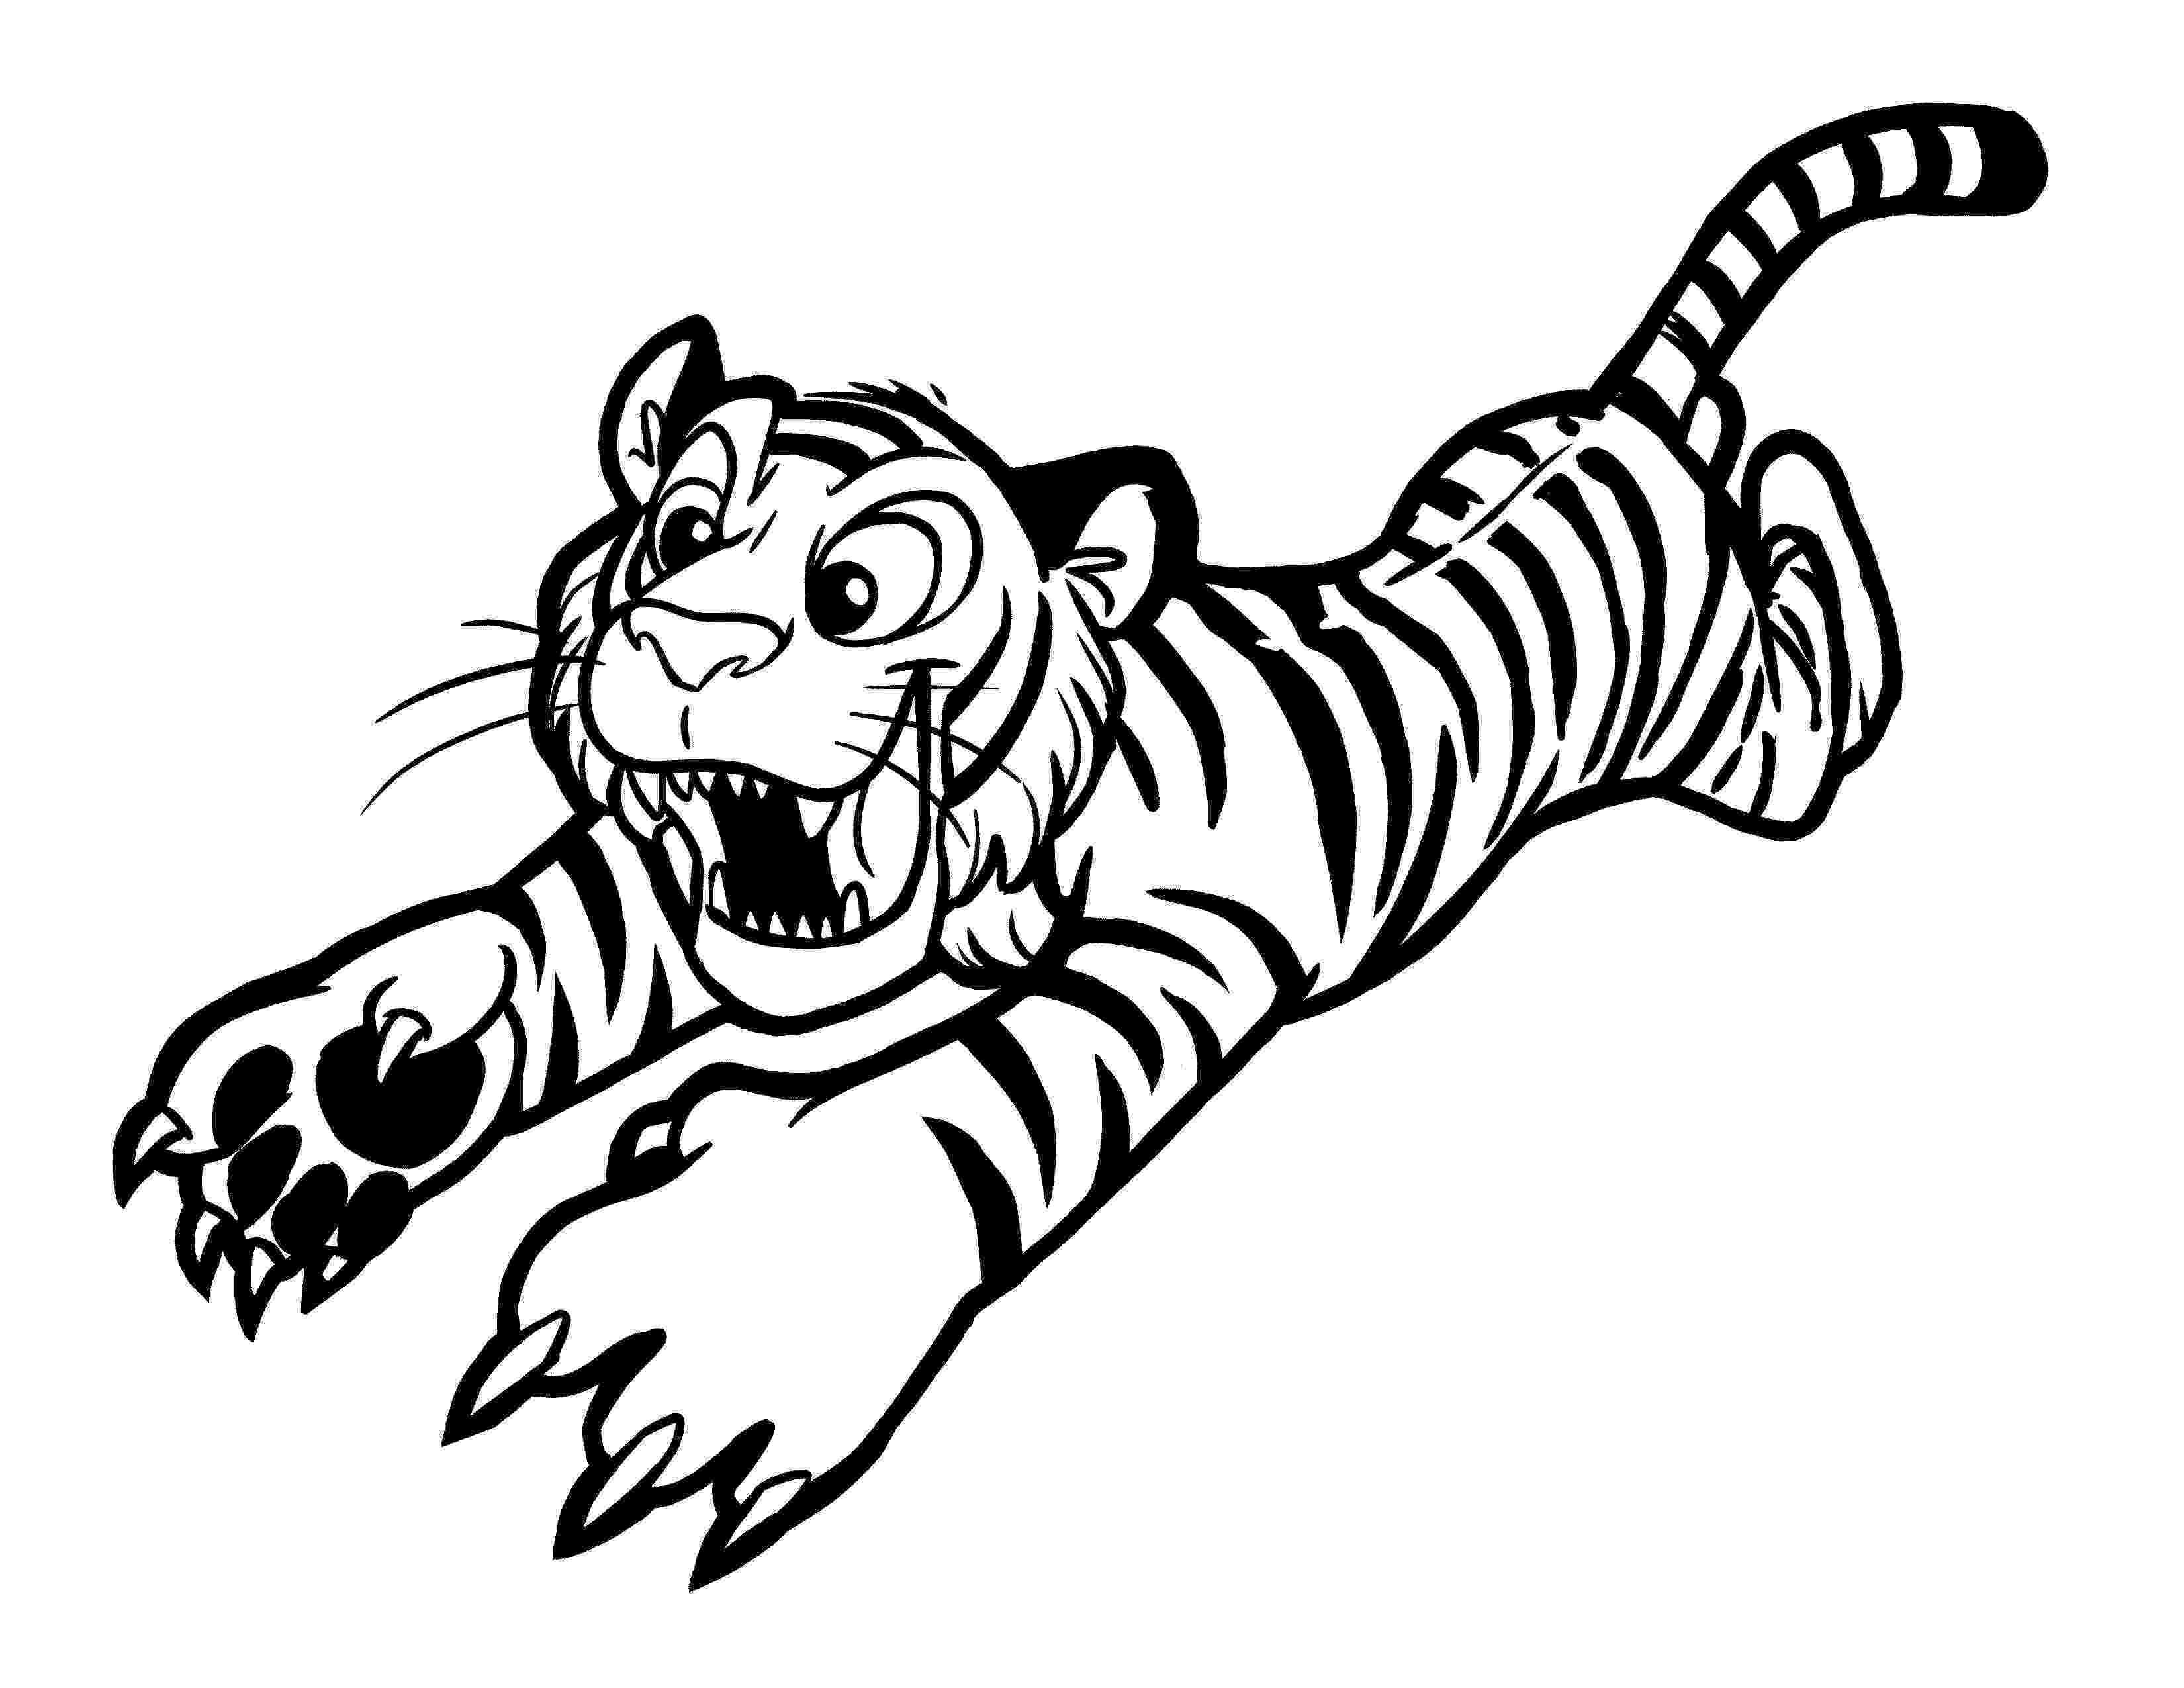 coloring book tiger free printable tiger coloring pages for kids coloring book tiger 1 1